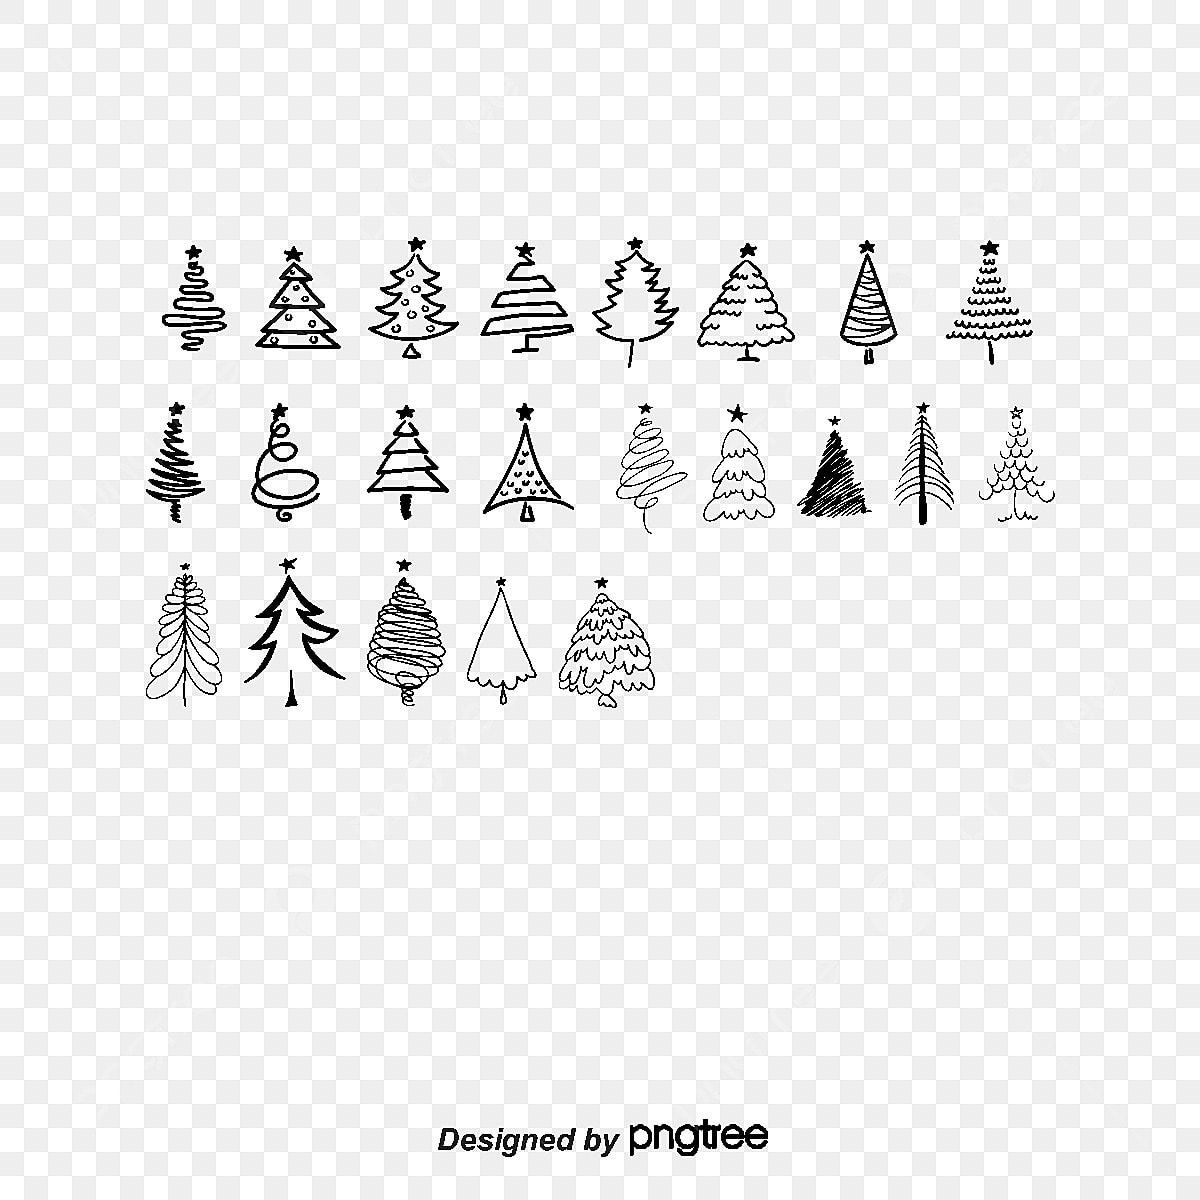 Christmas Tree Clipart Silhouette.Vector Black Silhouettes Christmas Tree Tree Clipart